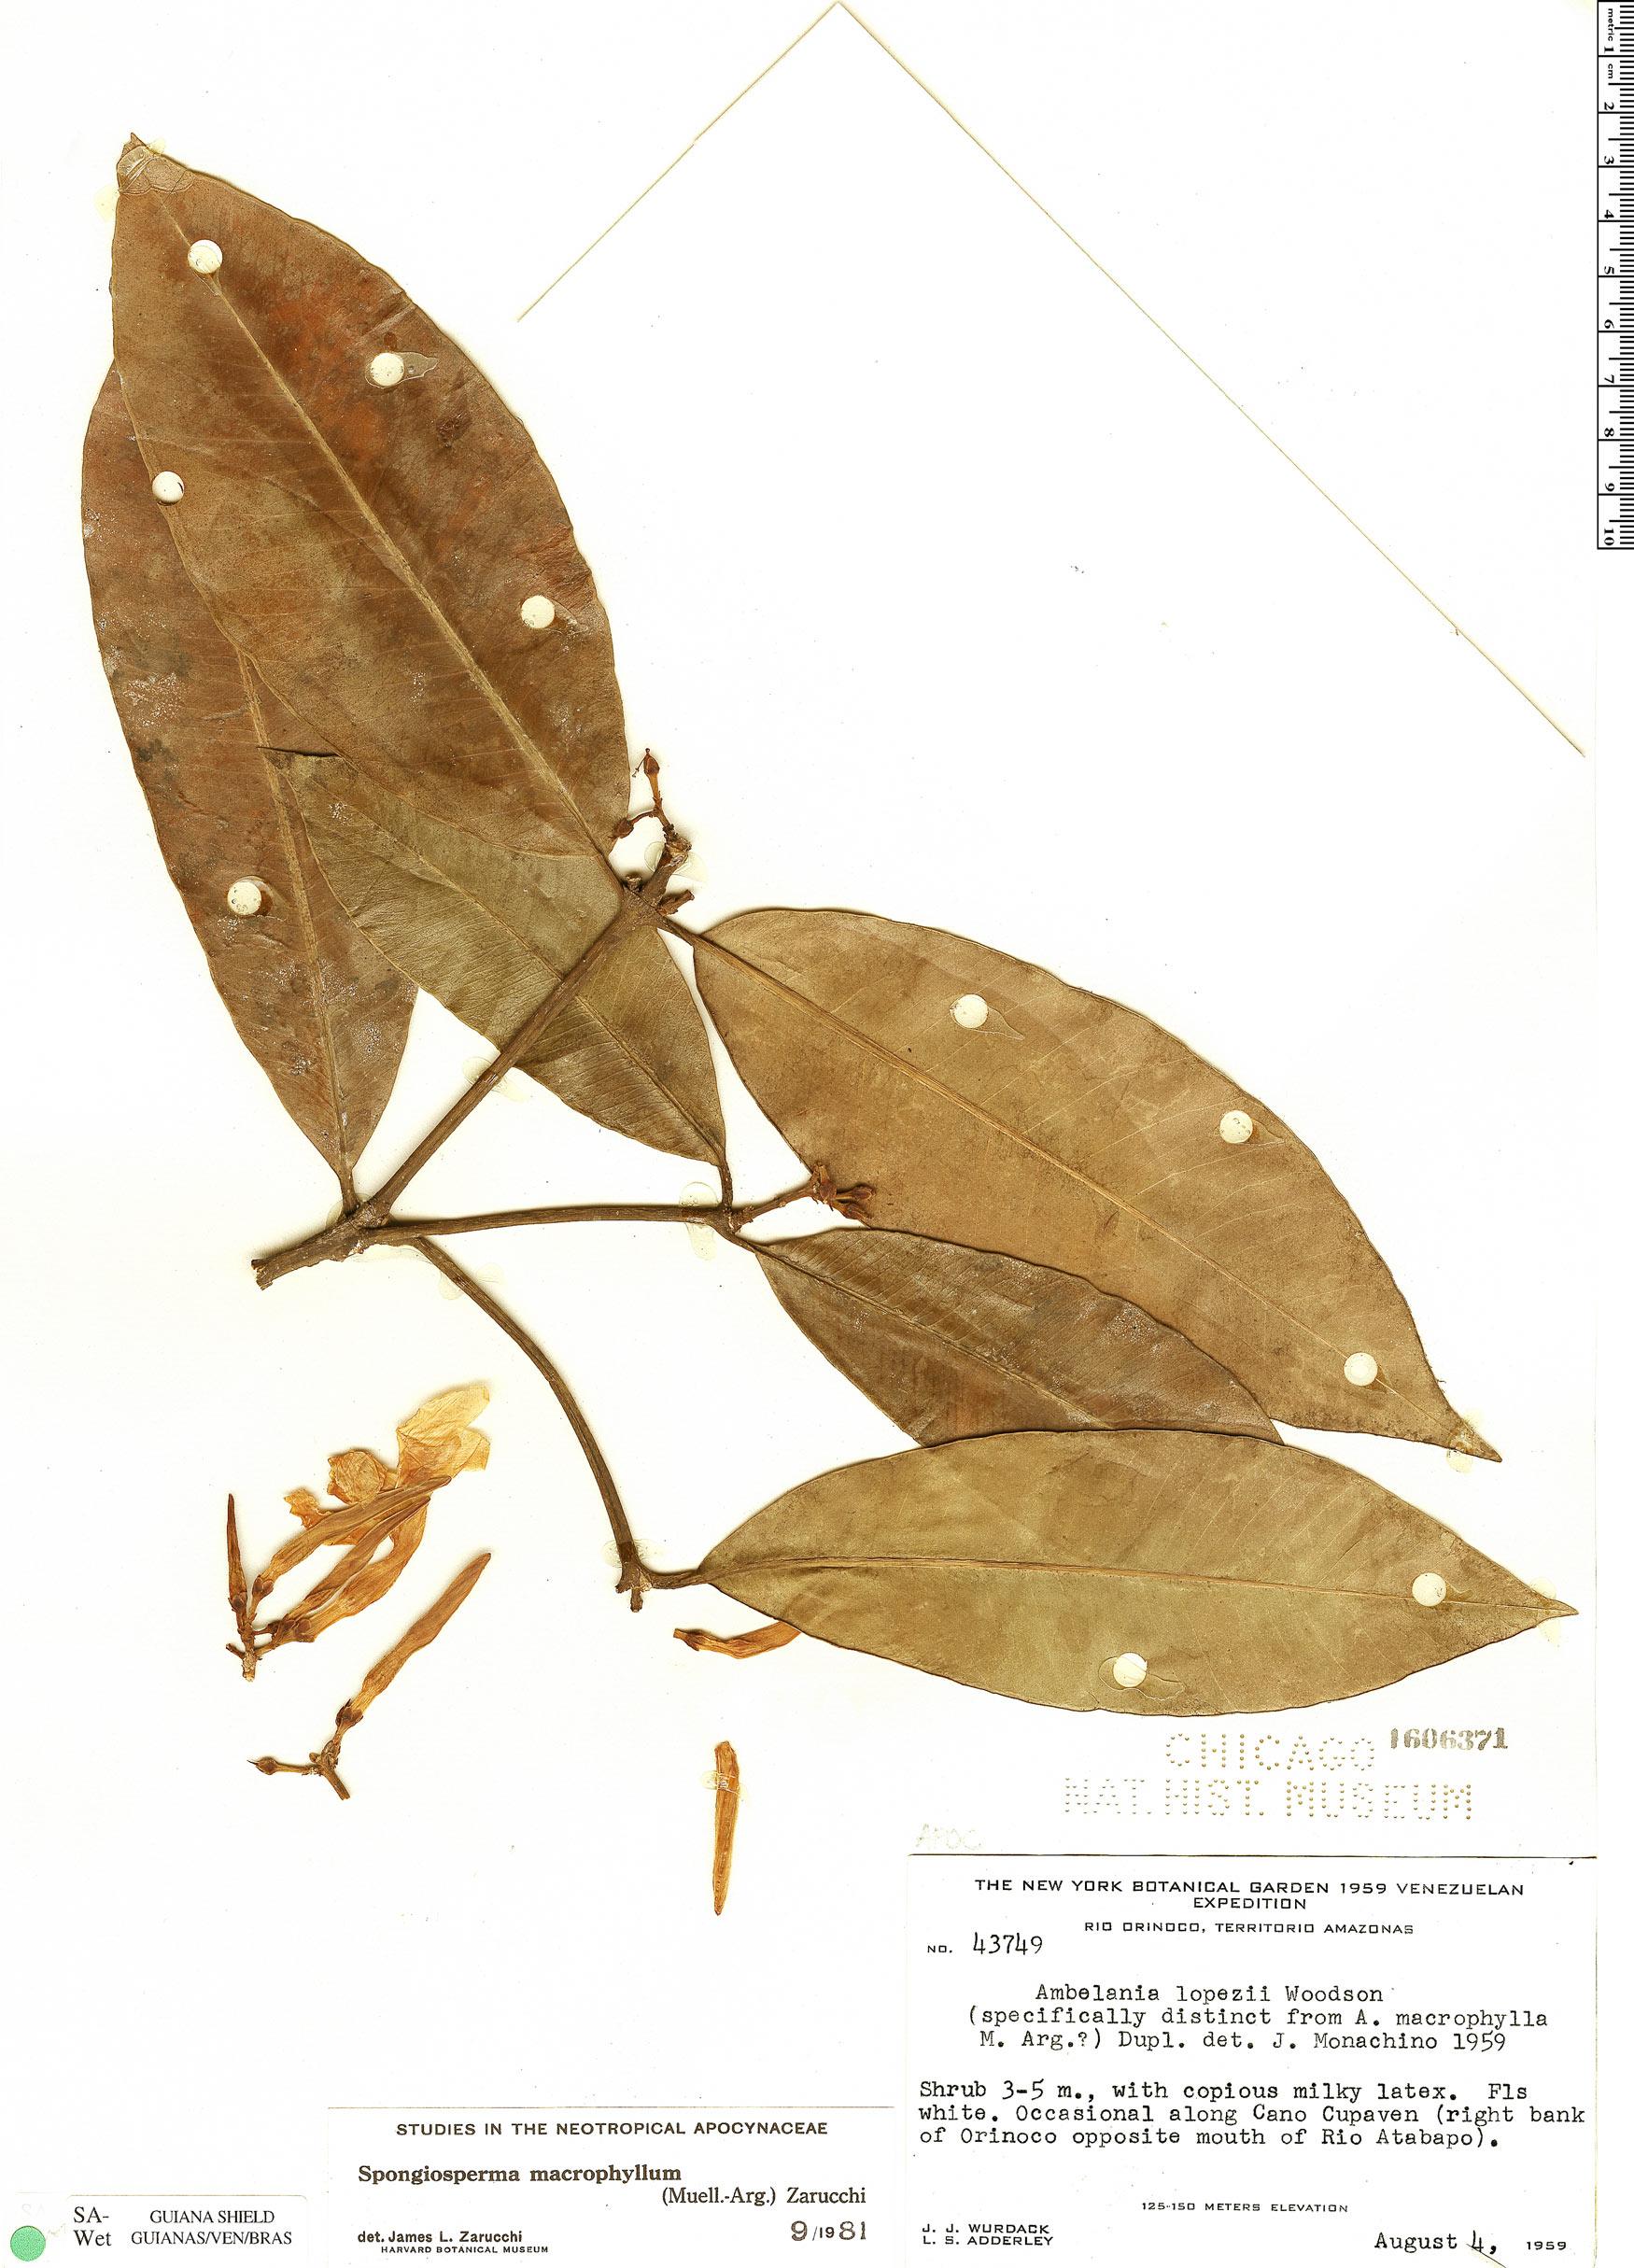 Specimen: Spongiosperma macrophyllum